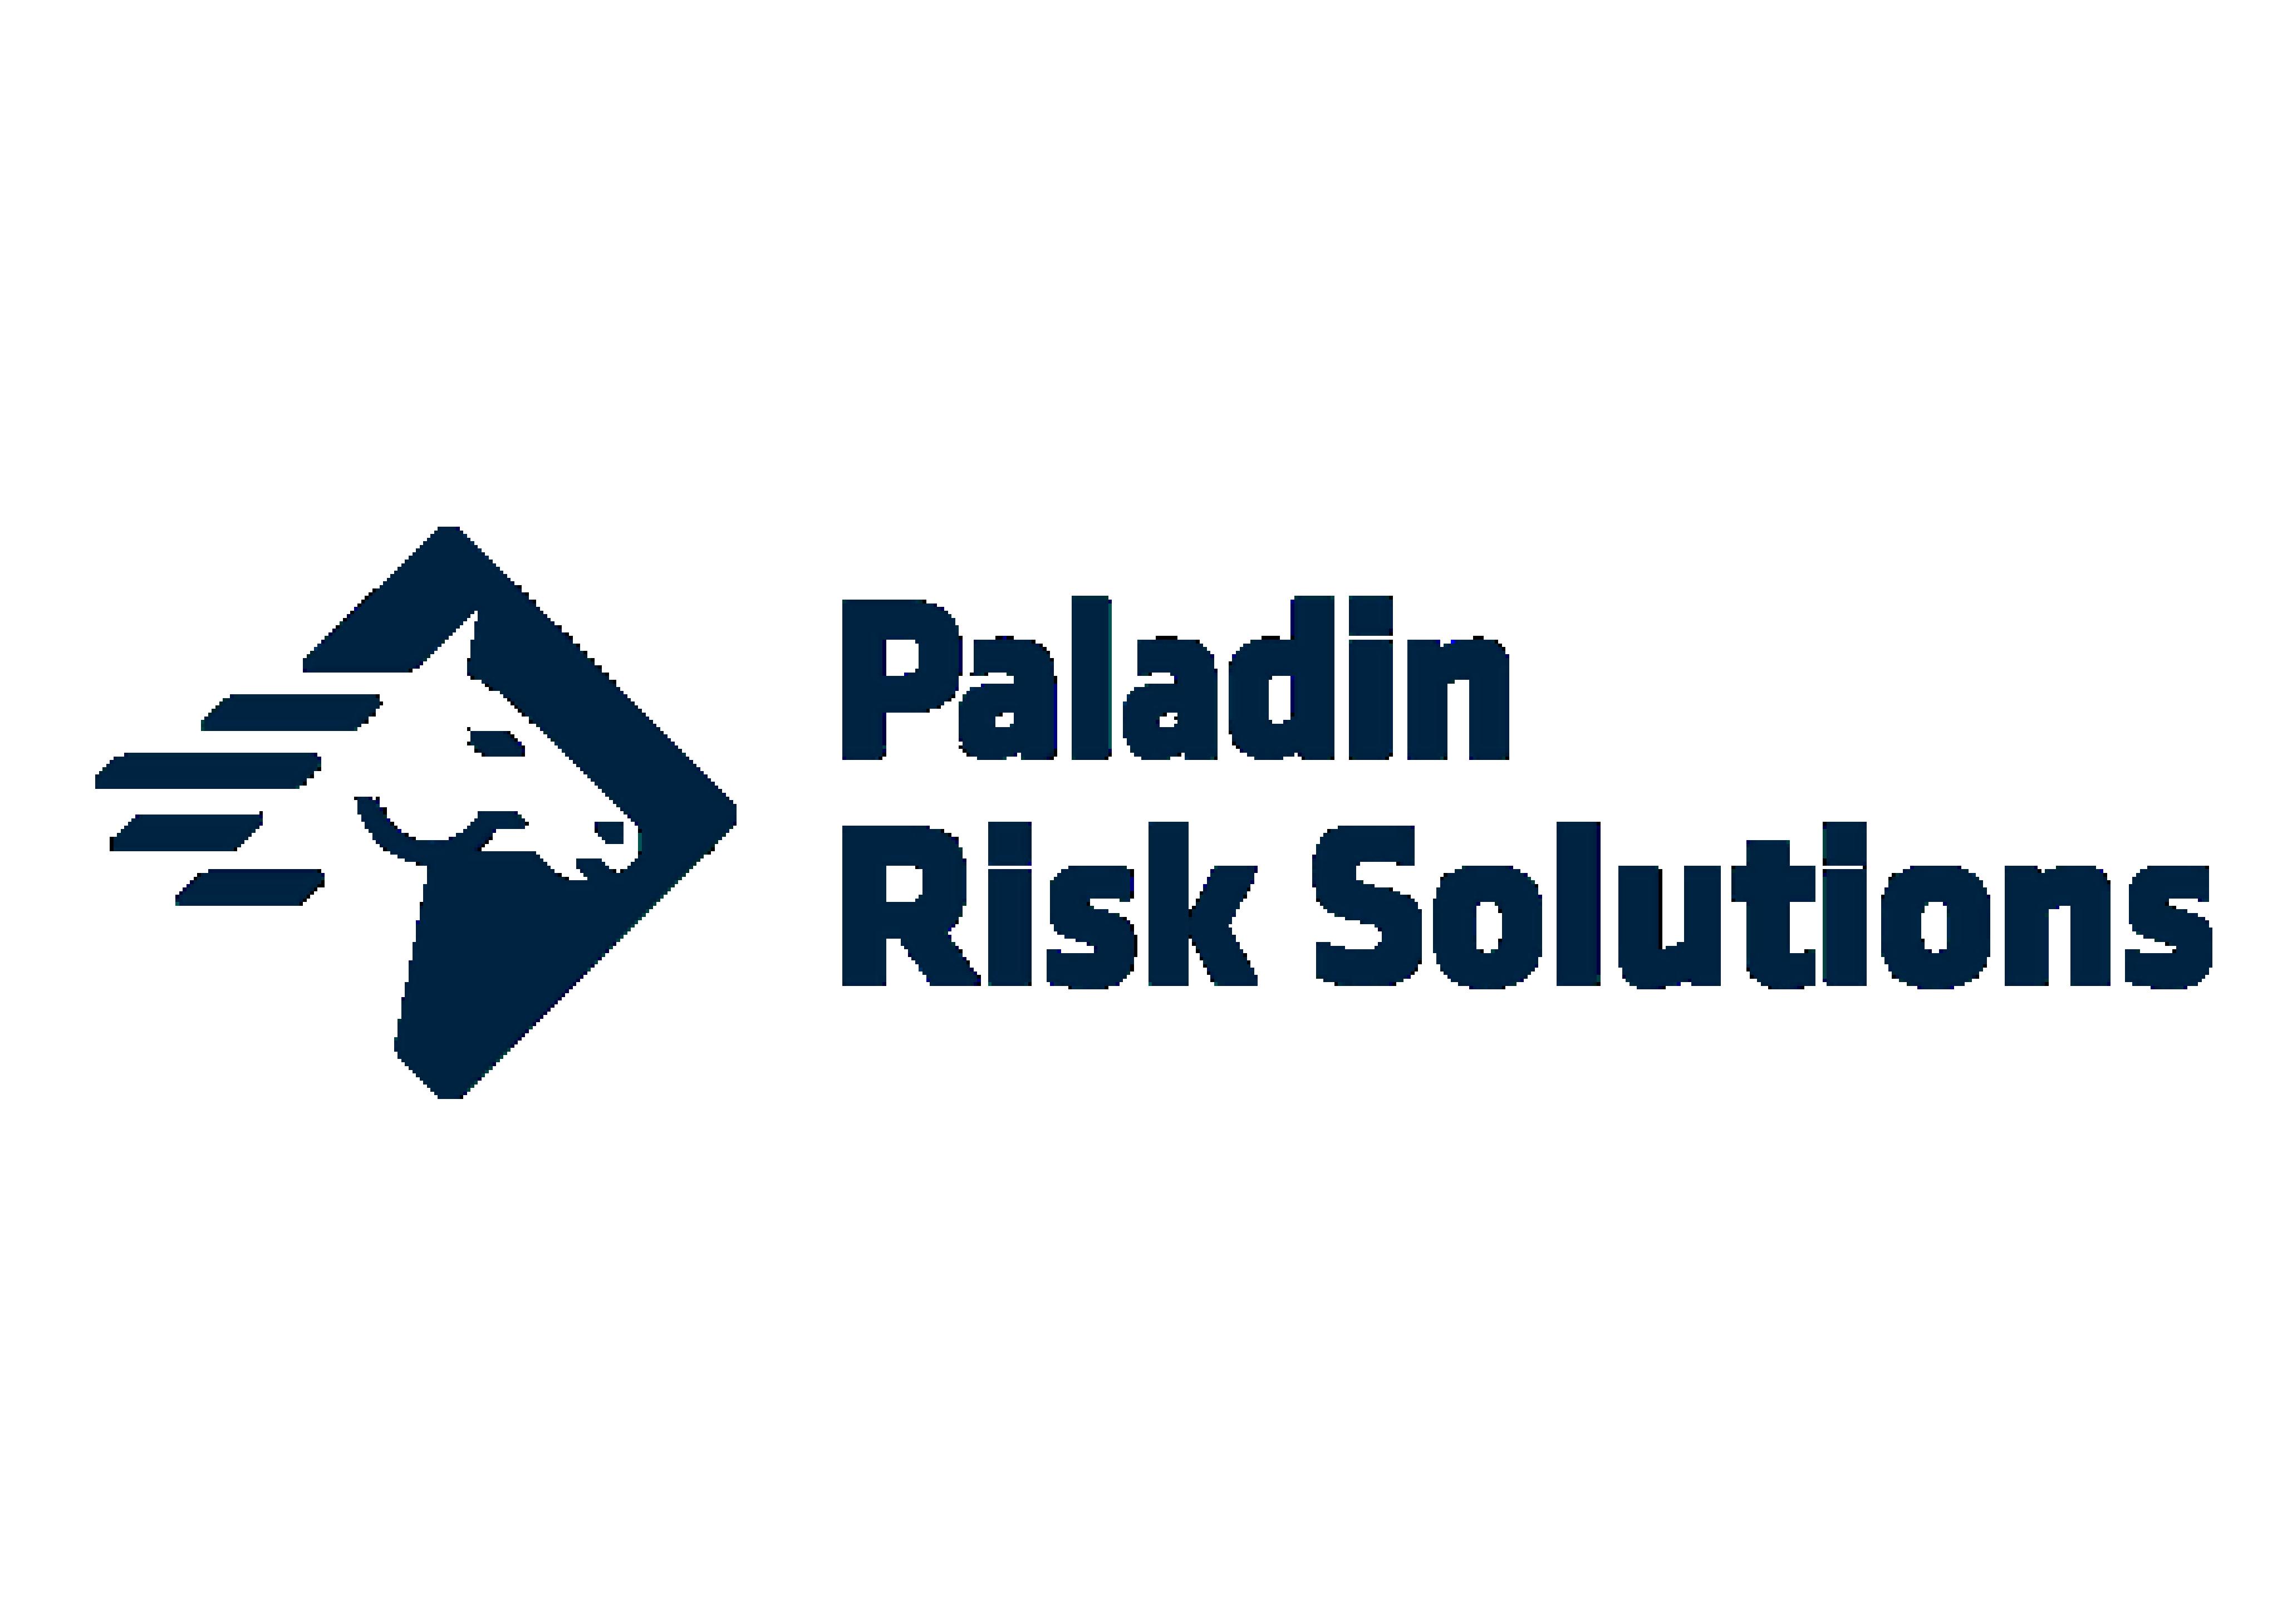 https://paladinsecurity.com/wp-content/uploads/2021/05/PRSI-01.png